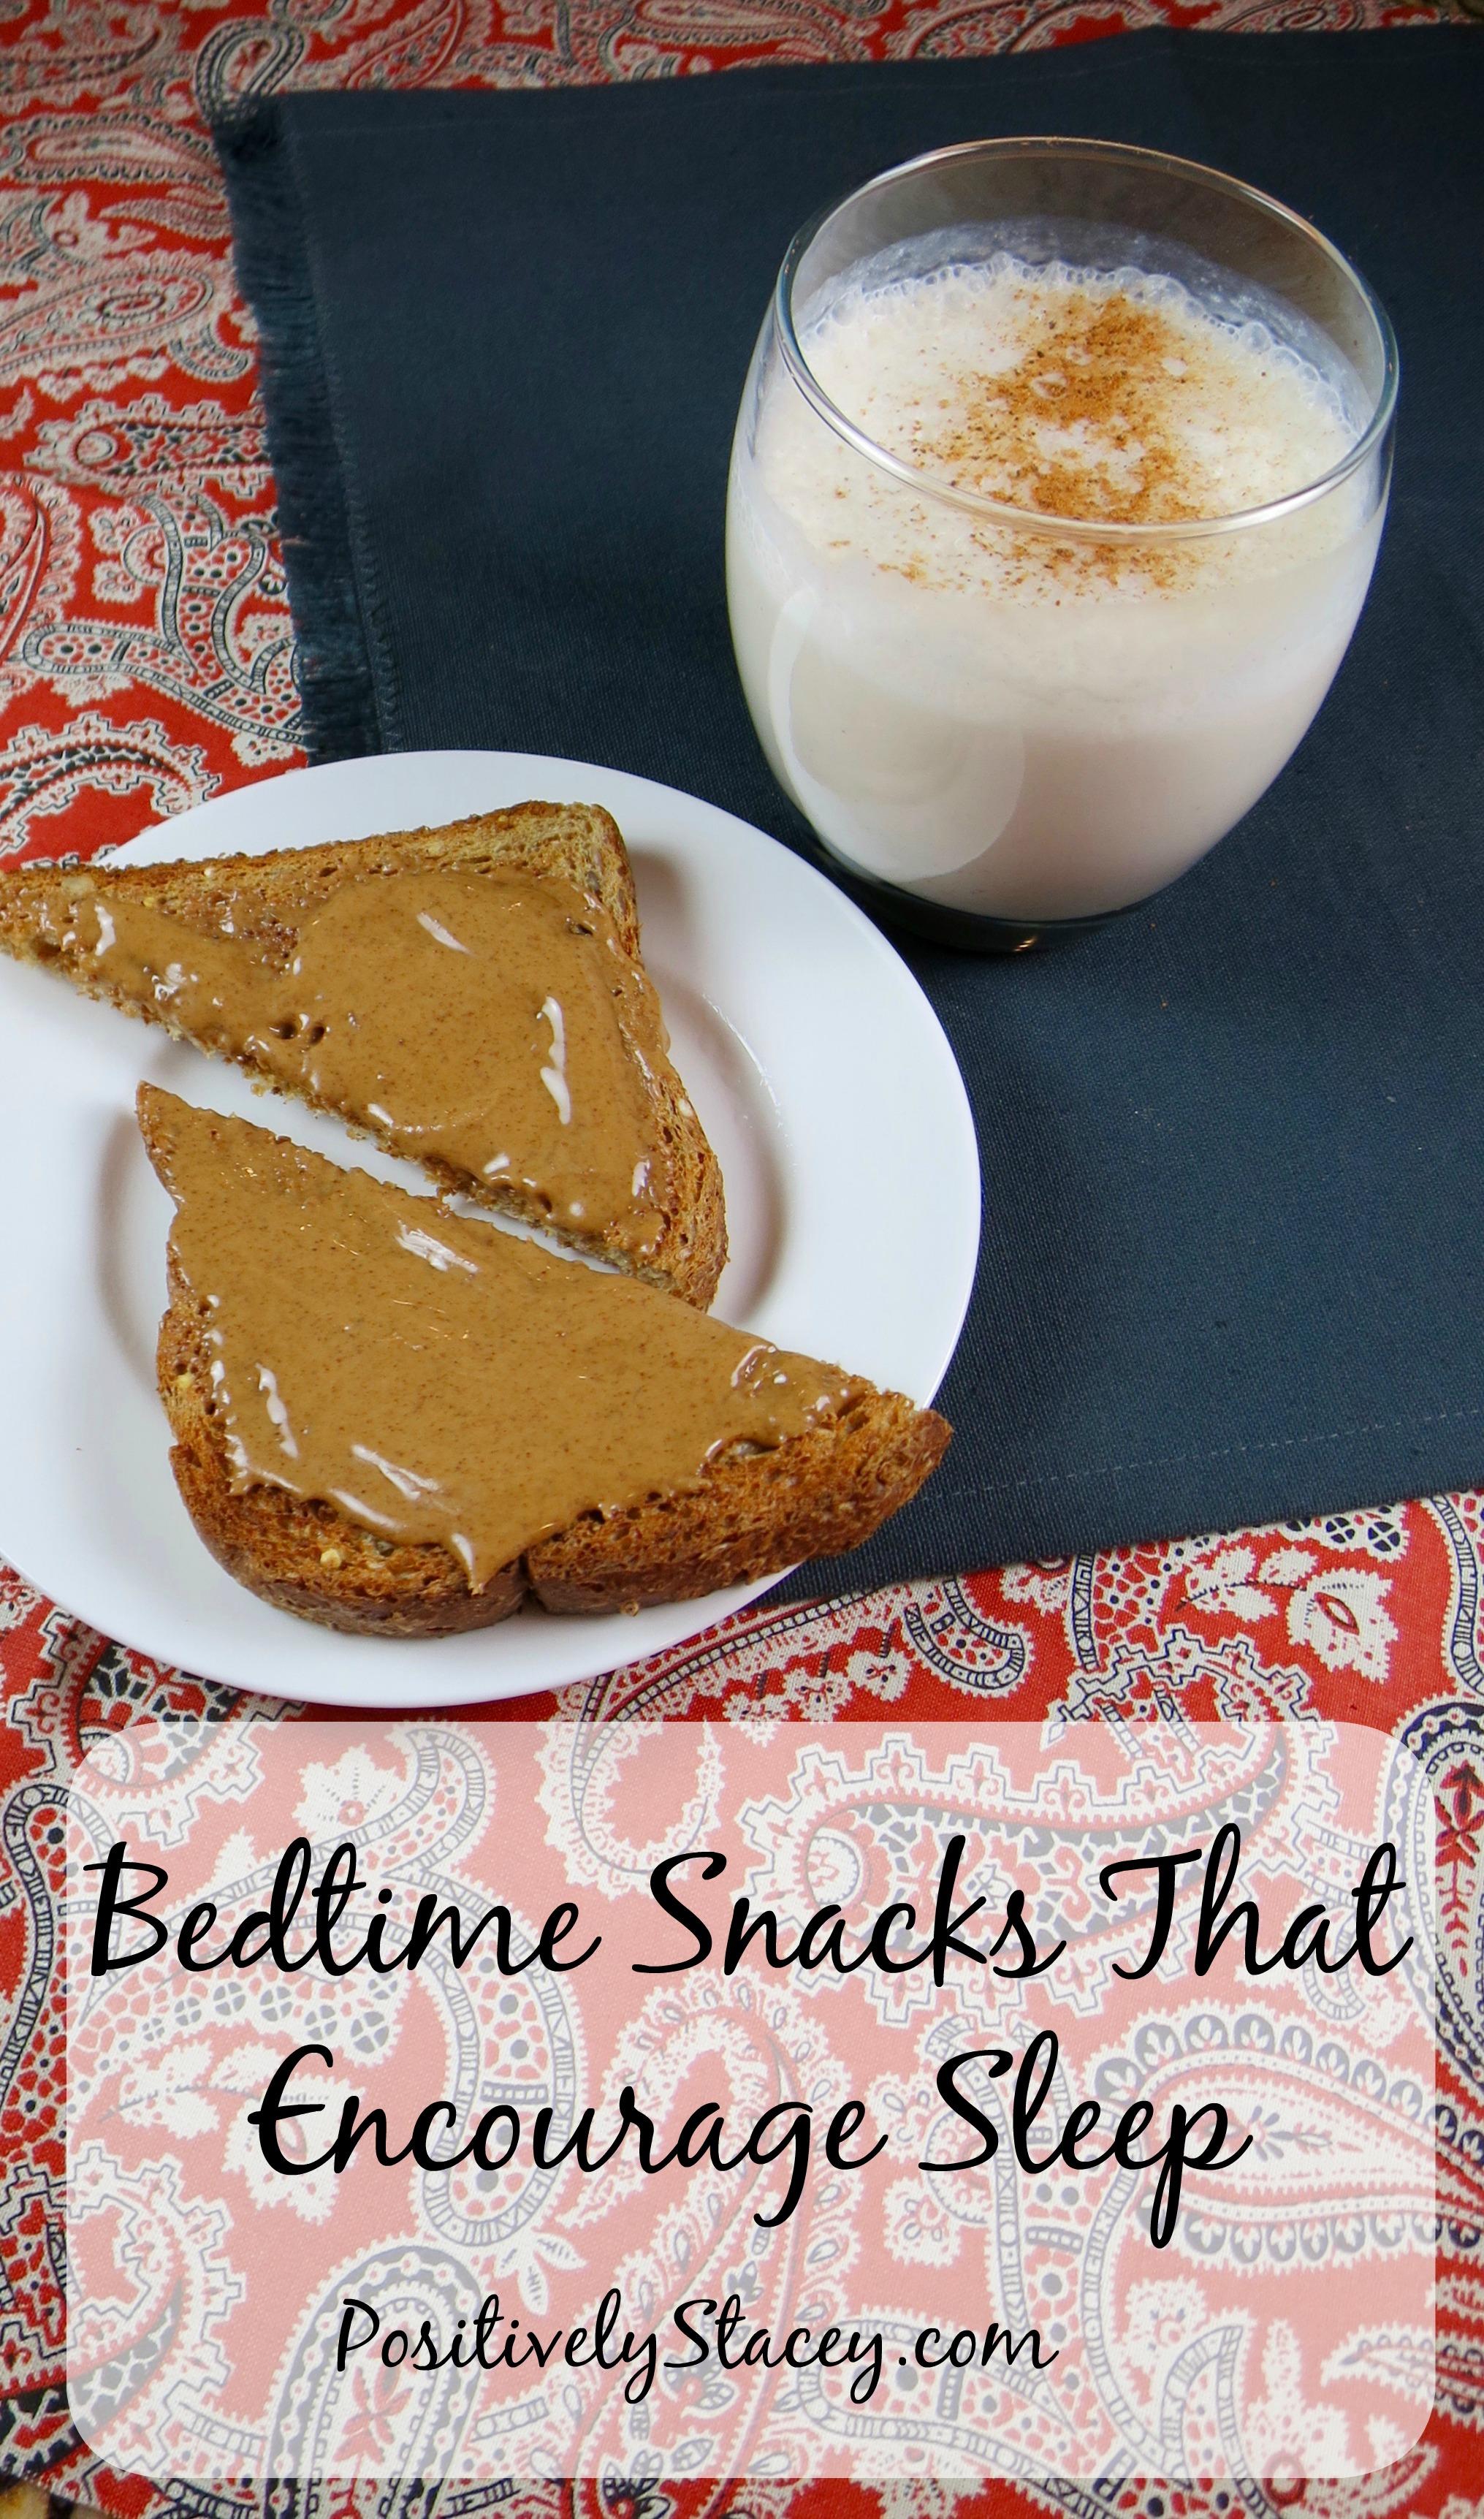 Yummy Bedtime Snacks That Encourage Sleep #FindRestEasy #ad